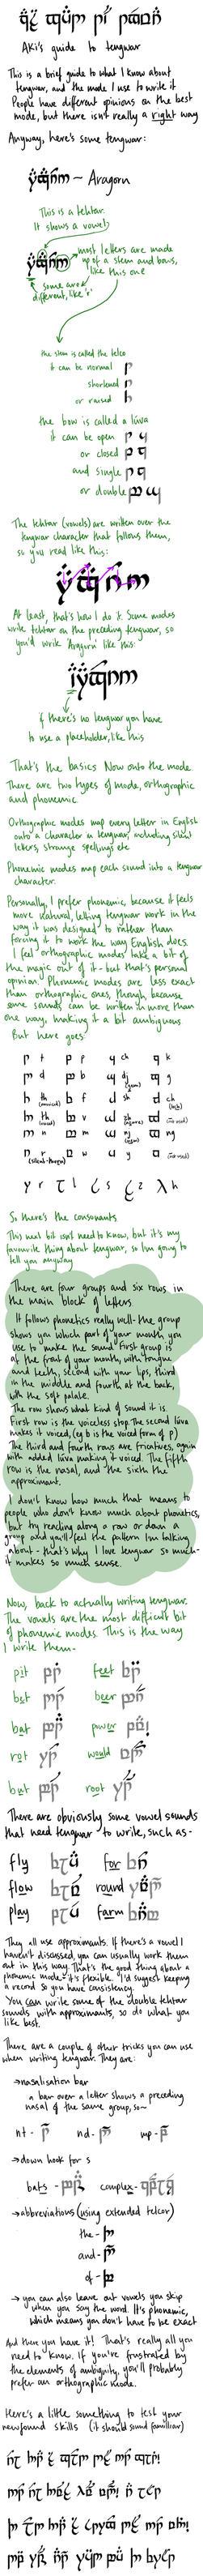 A Guide to Tengwar by Akinyi-Mojiko